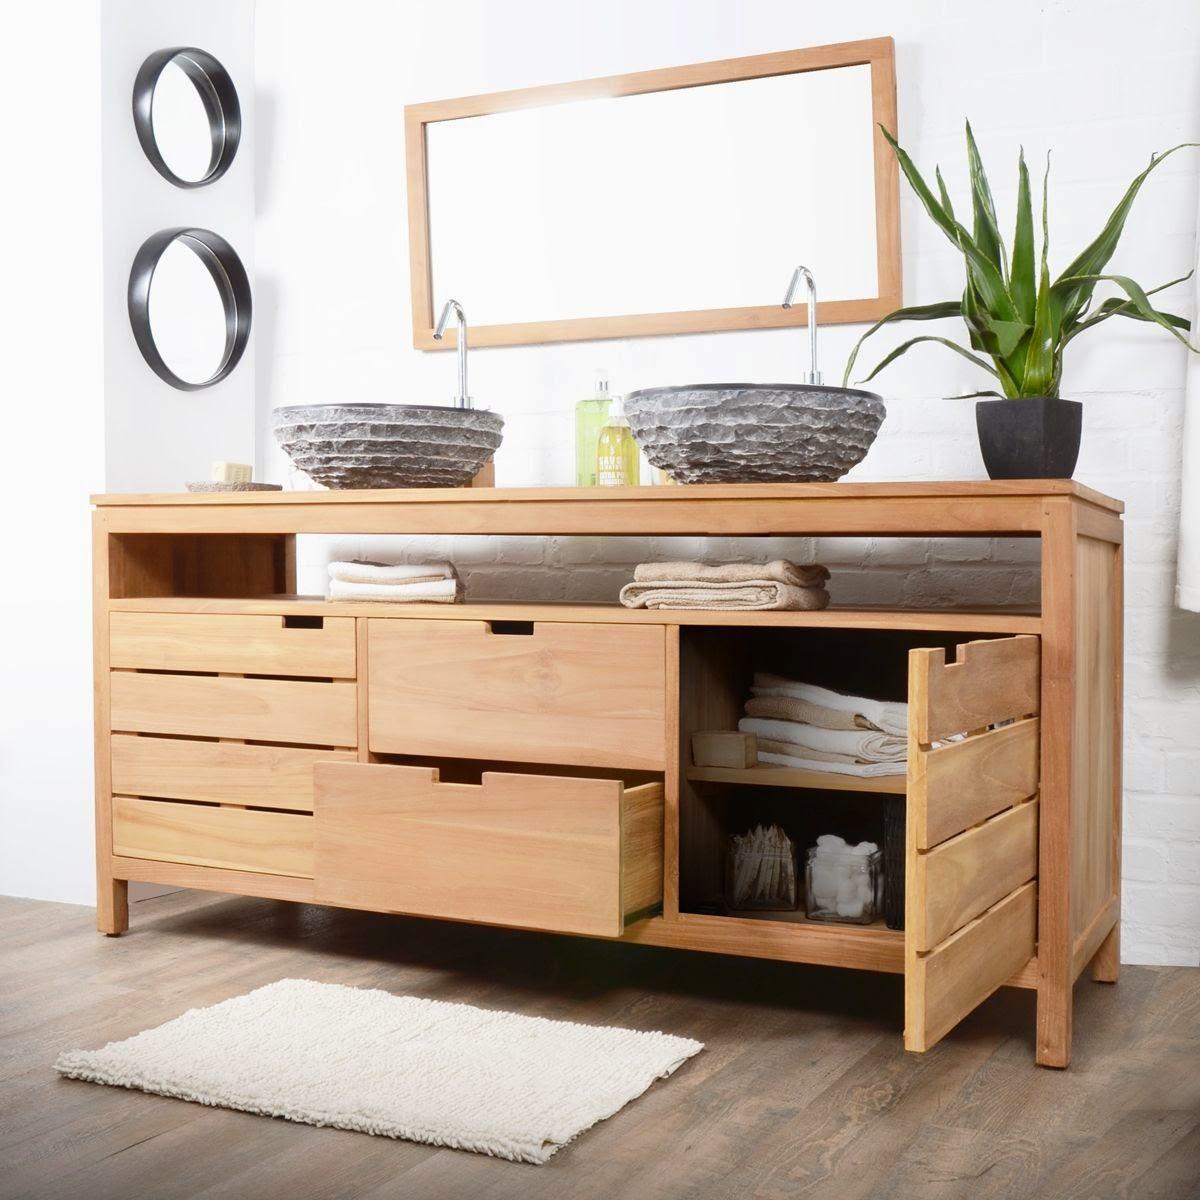 Meuble salle de bain bois 2 vasques meuble d coration maison for Meuble salle de salle de bain